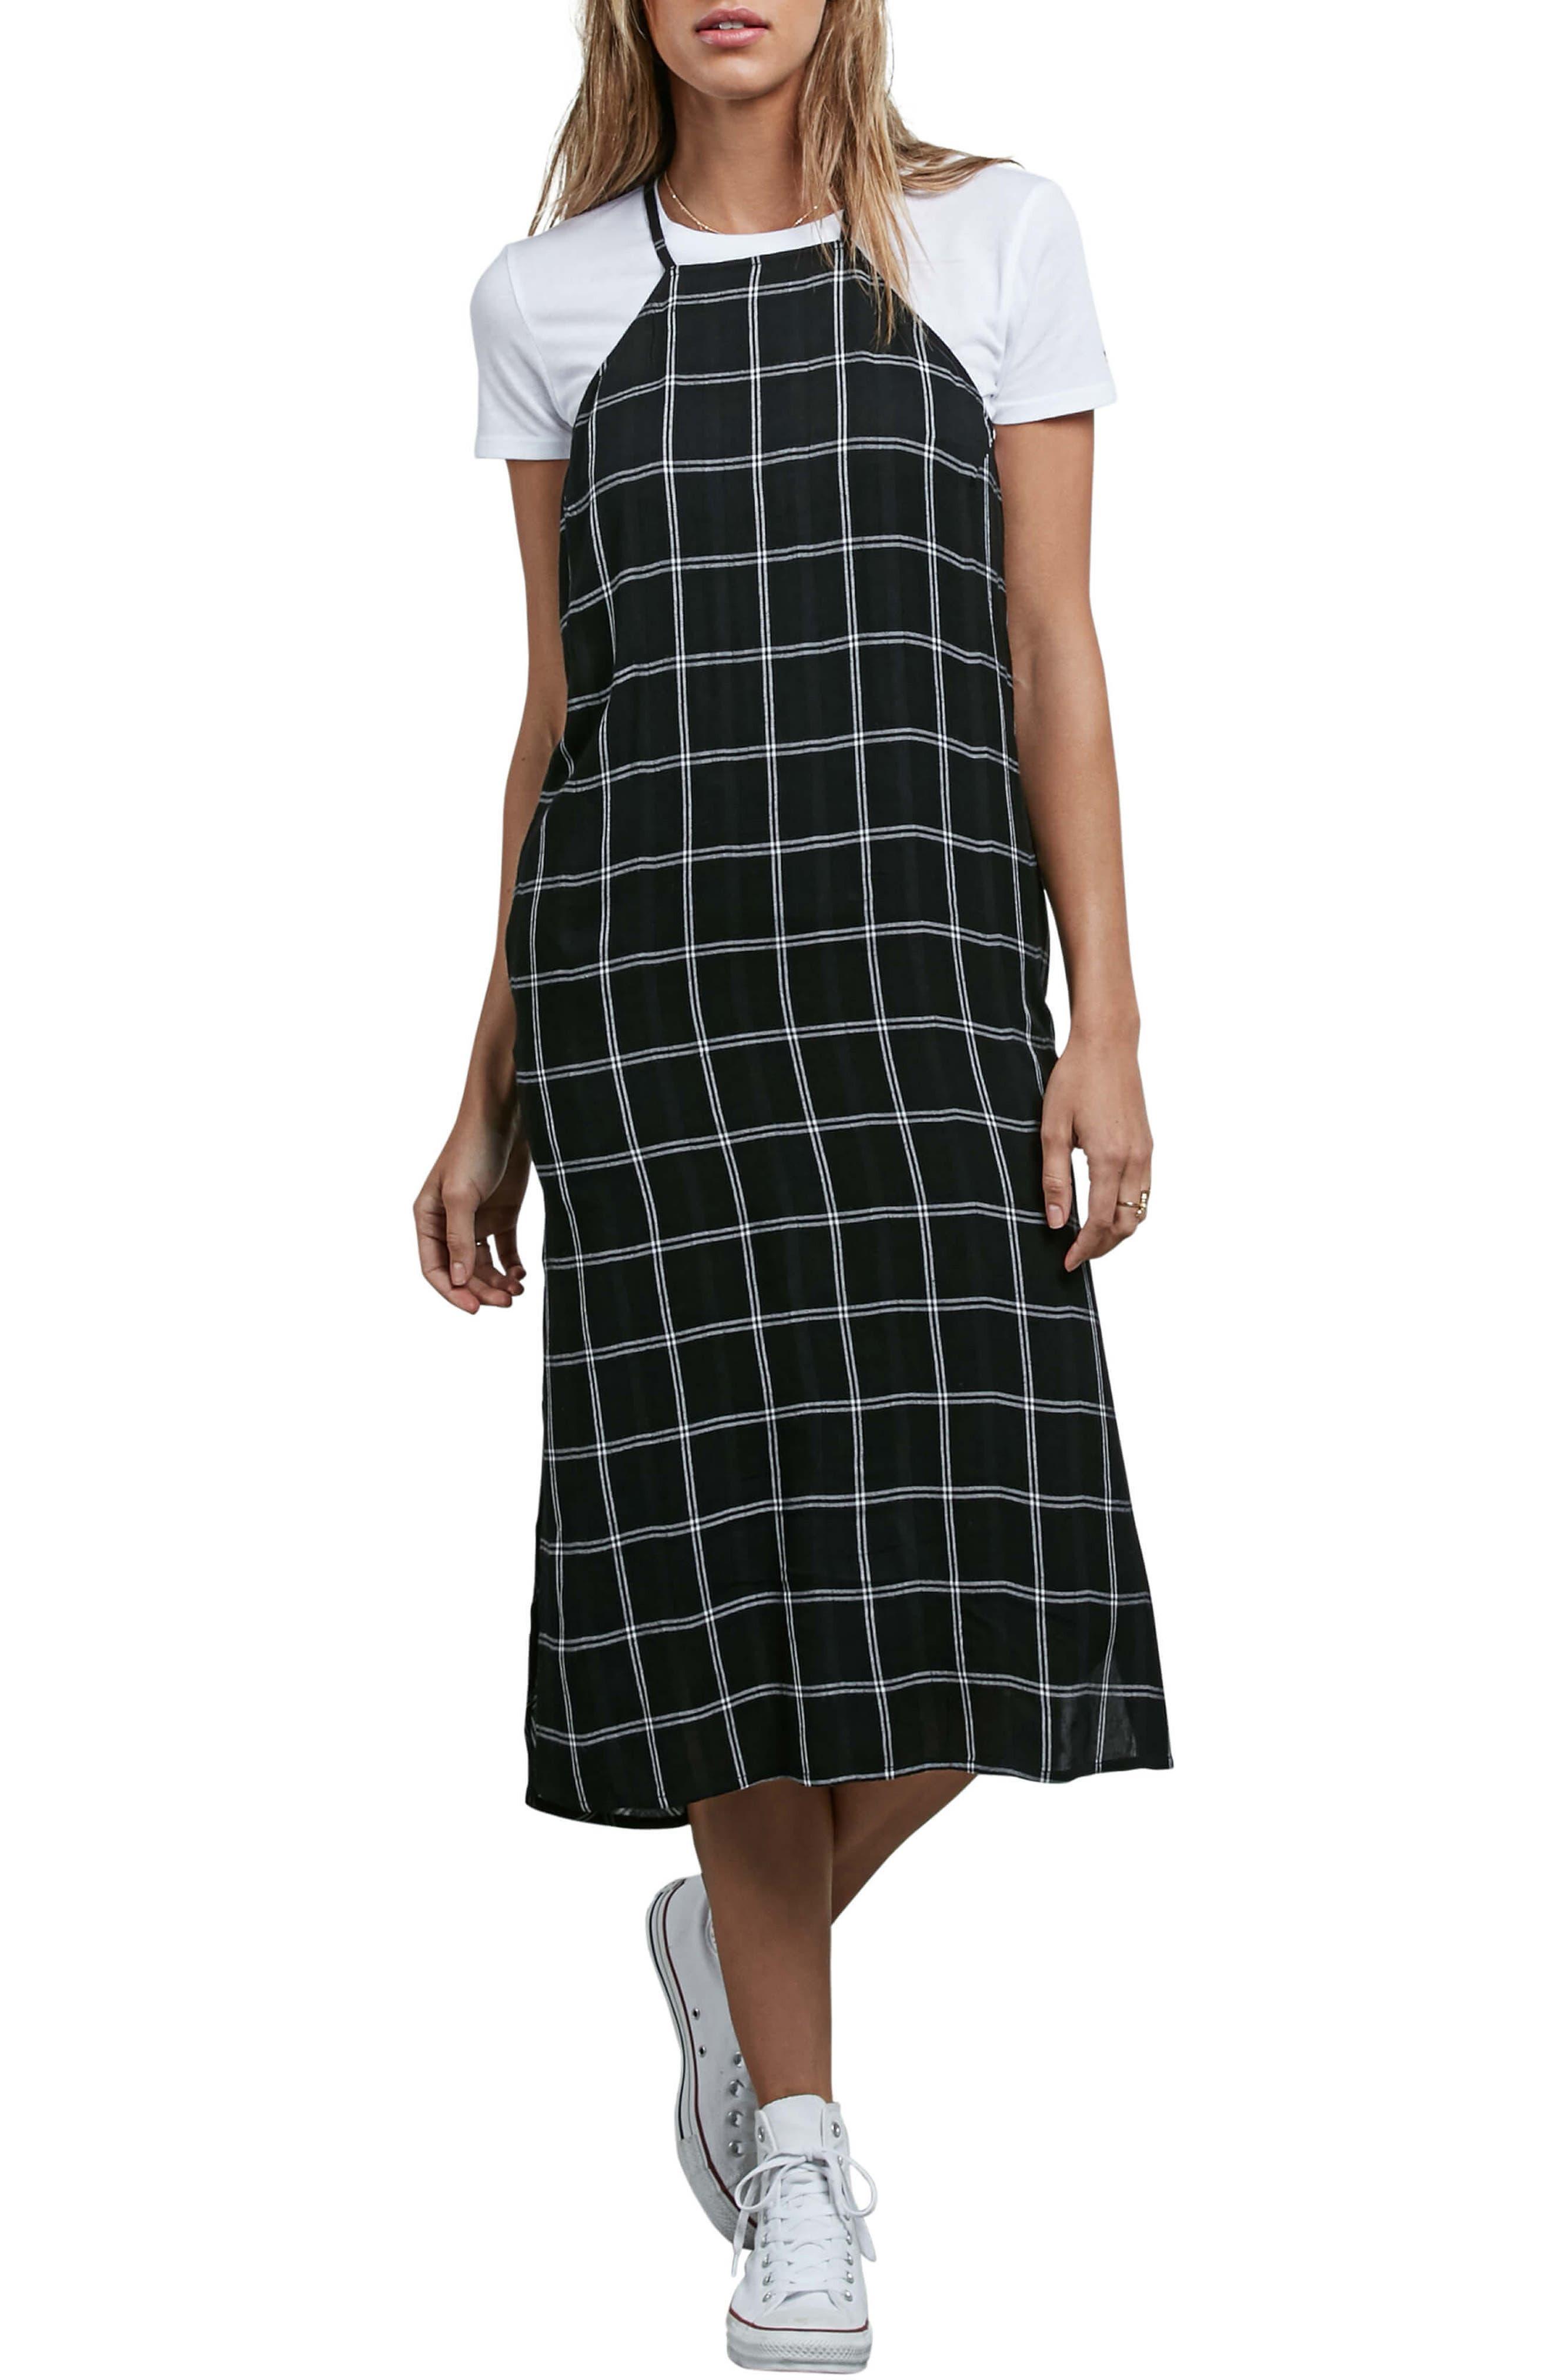 Jumponit Windowpane Print Midi Dress,                         Main,                         color,